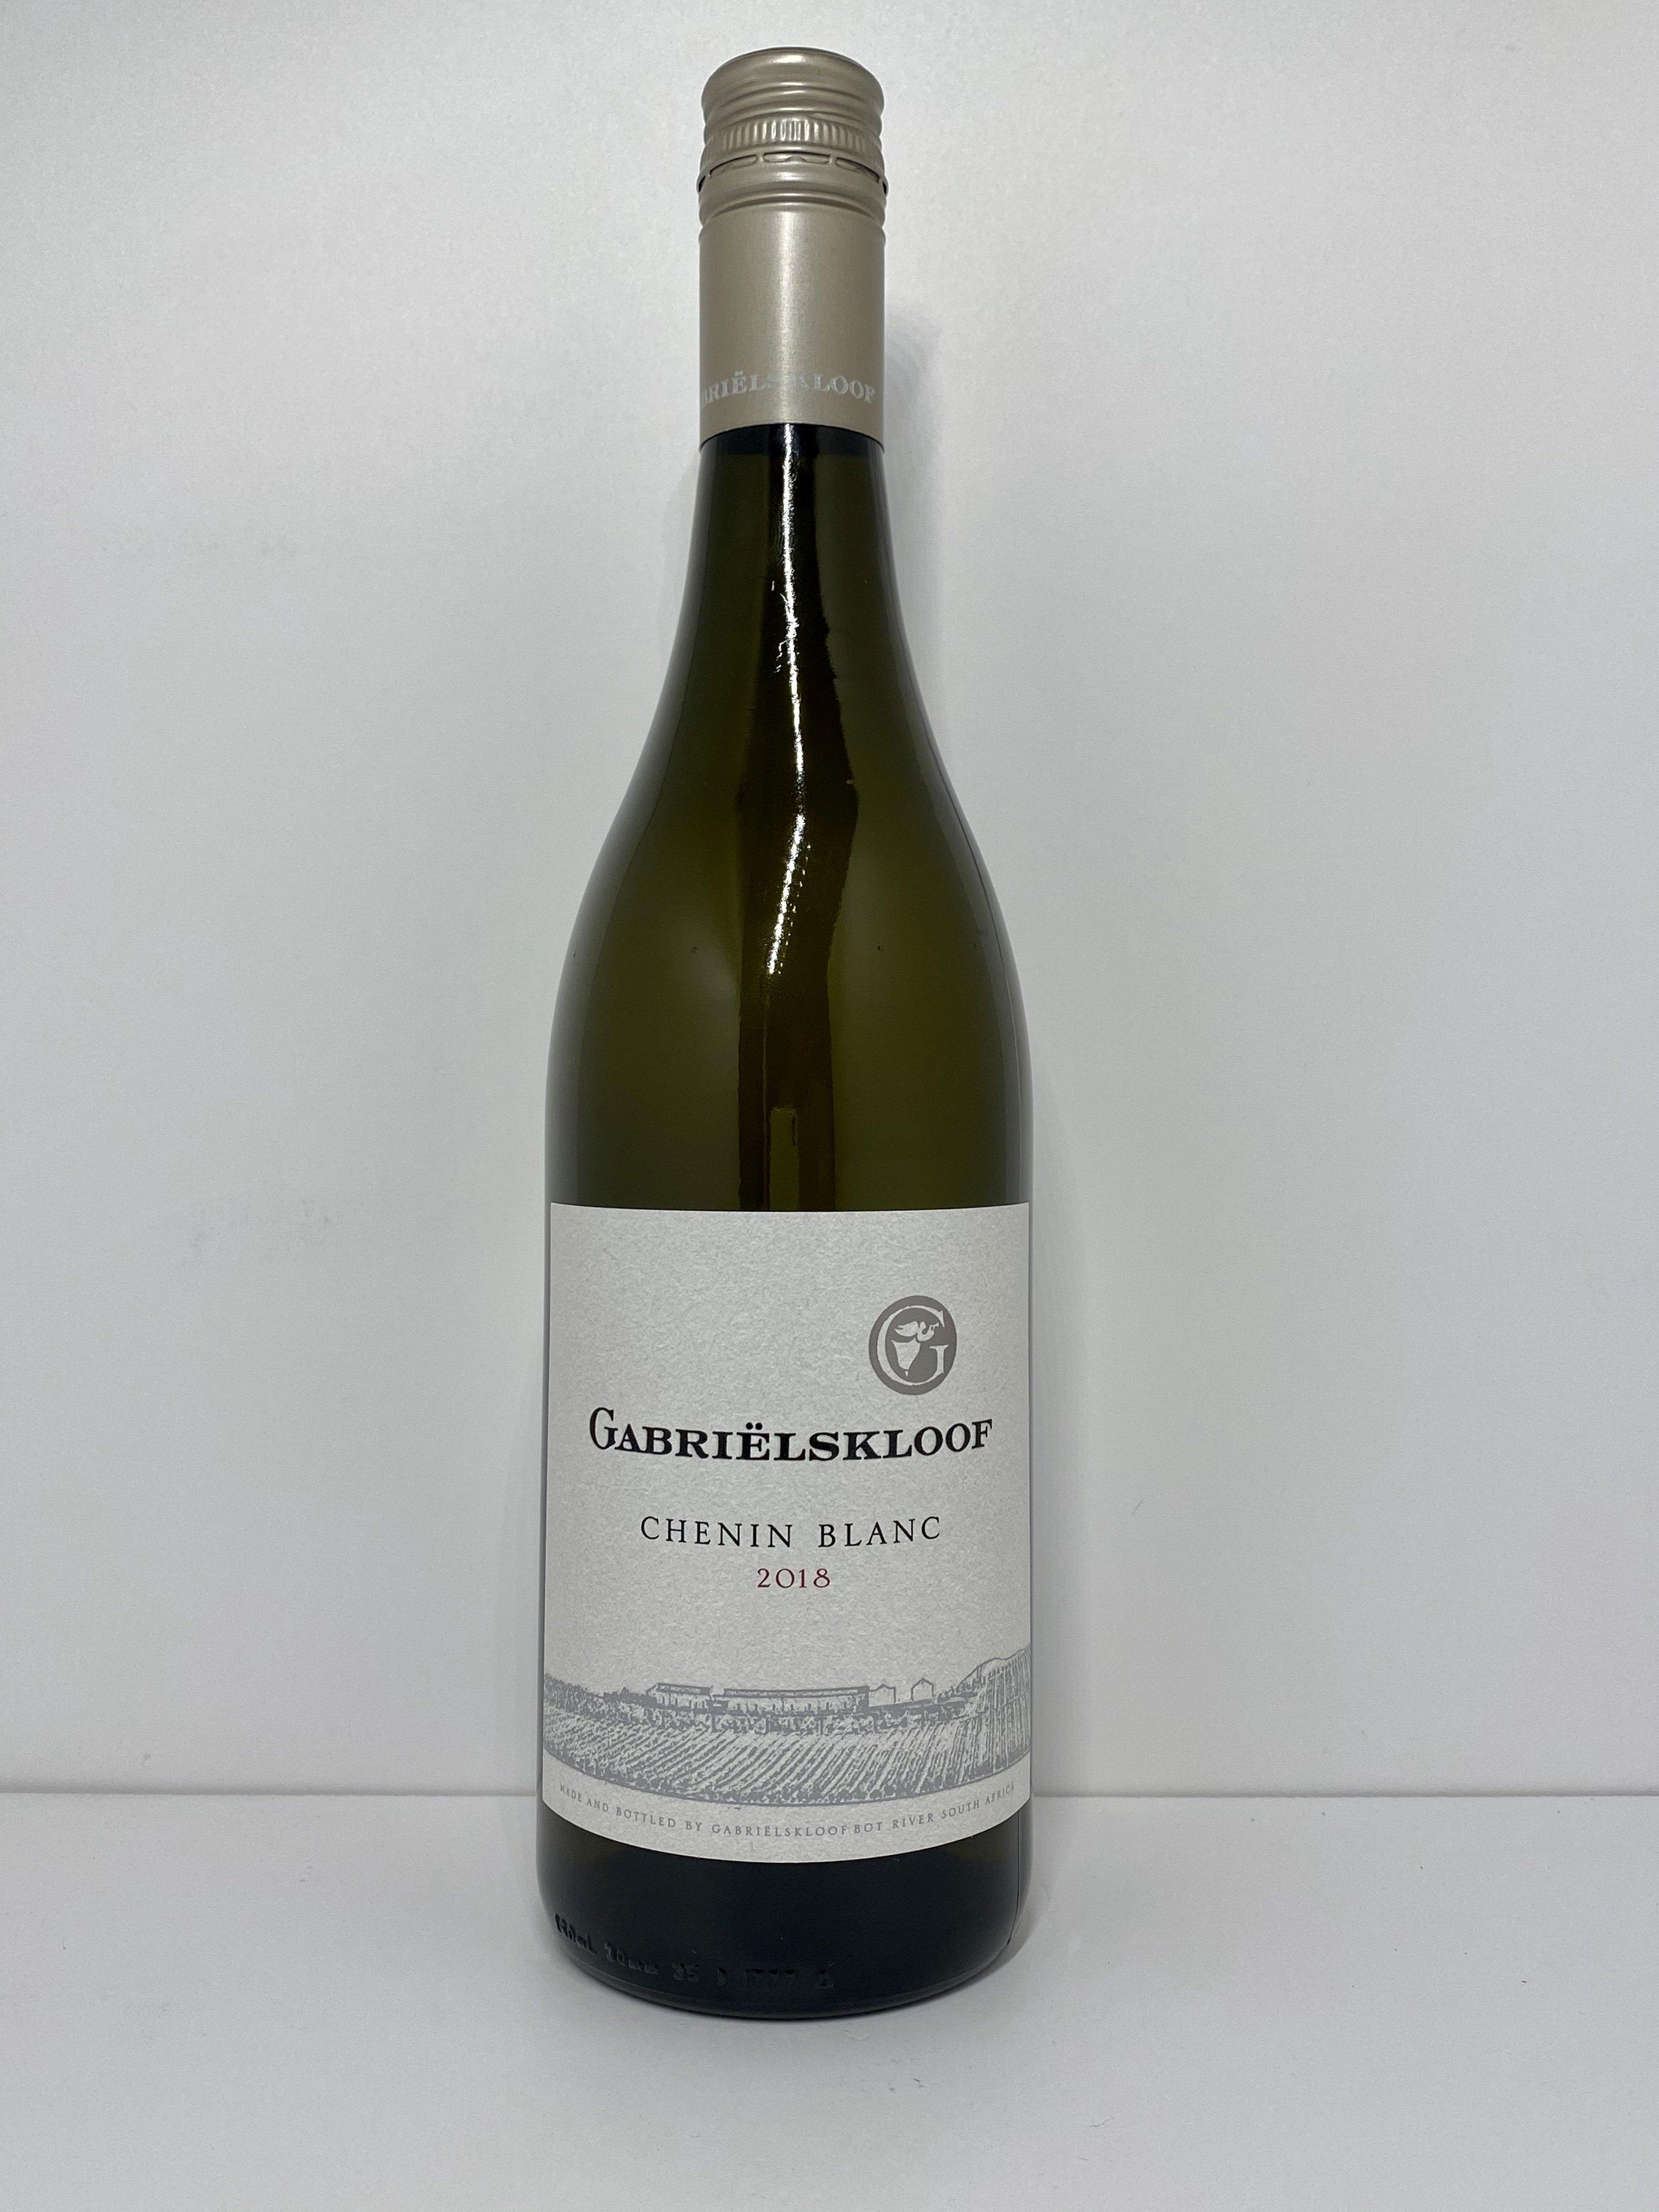 Gabrielskloof Chenin Blanc